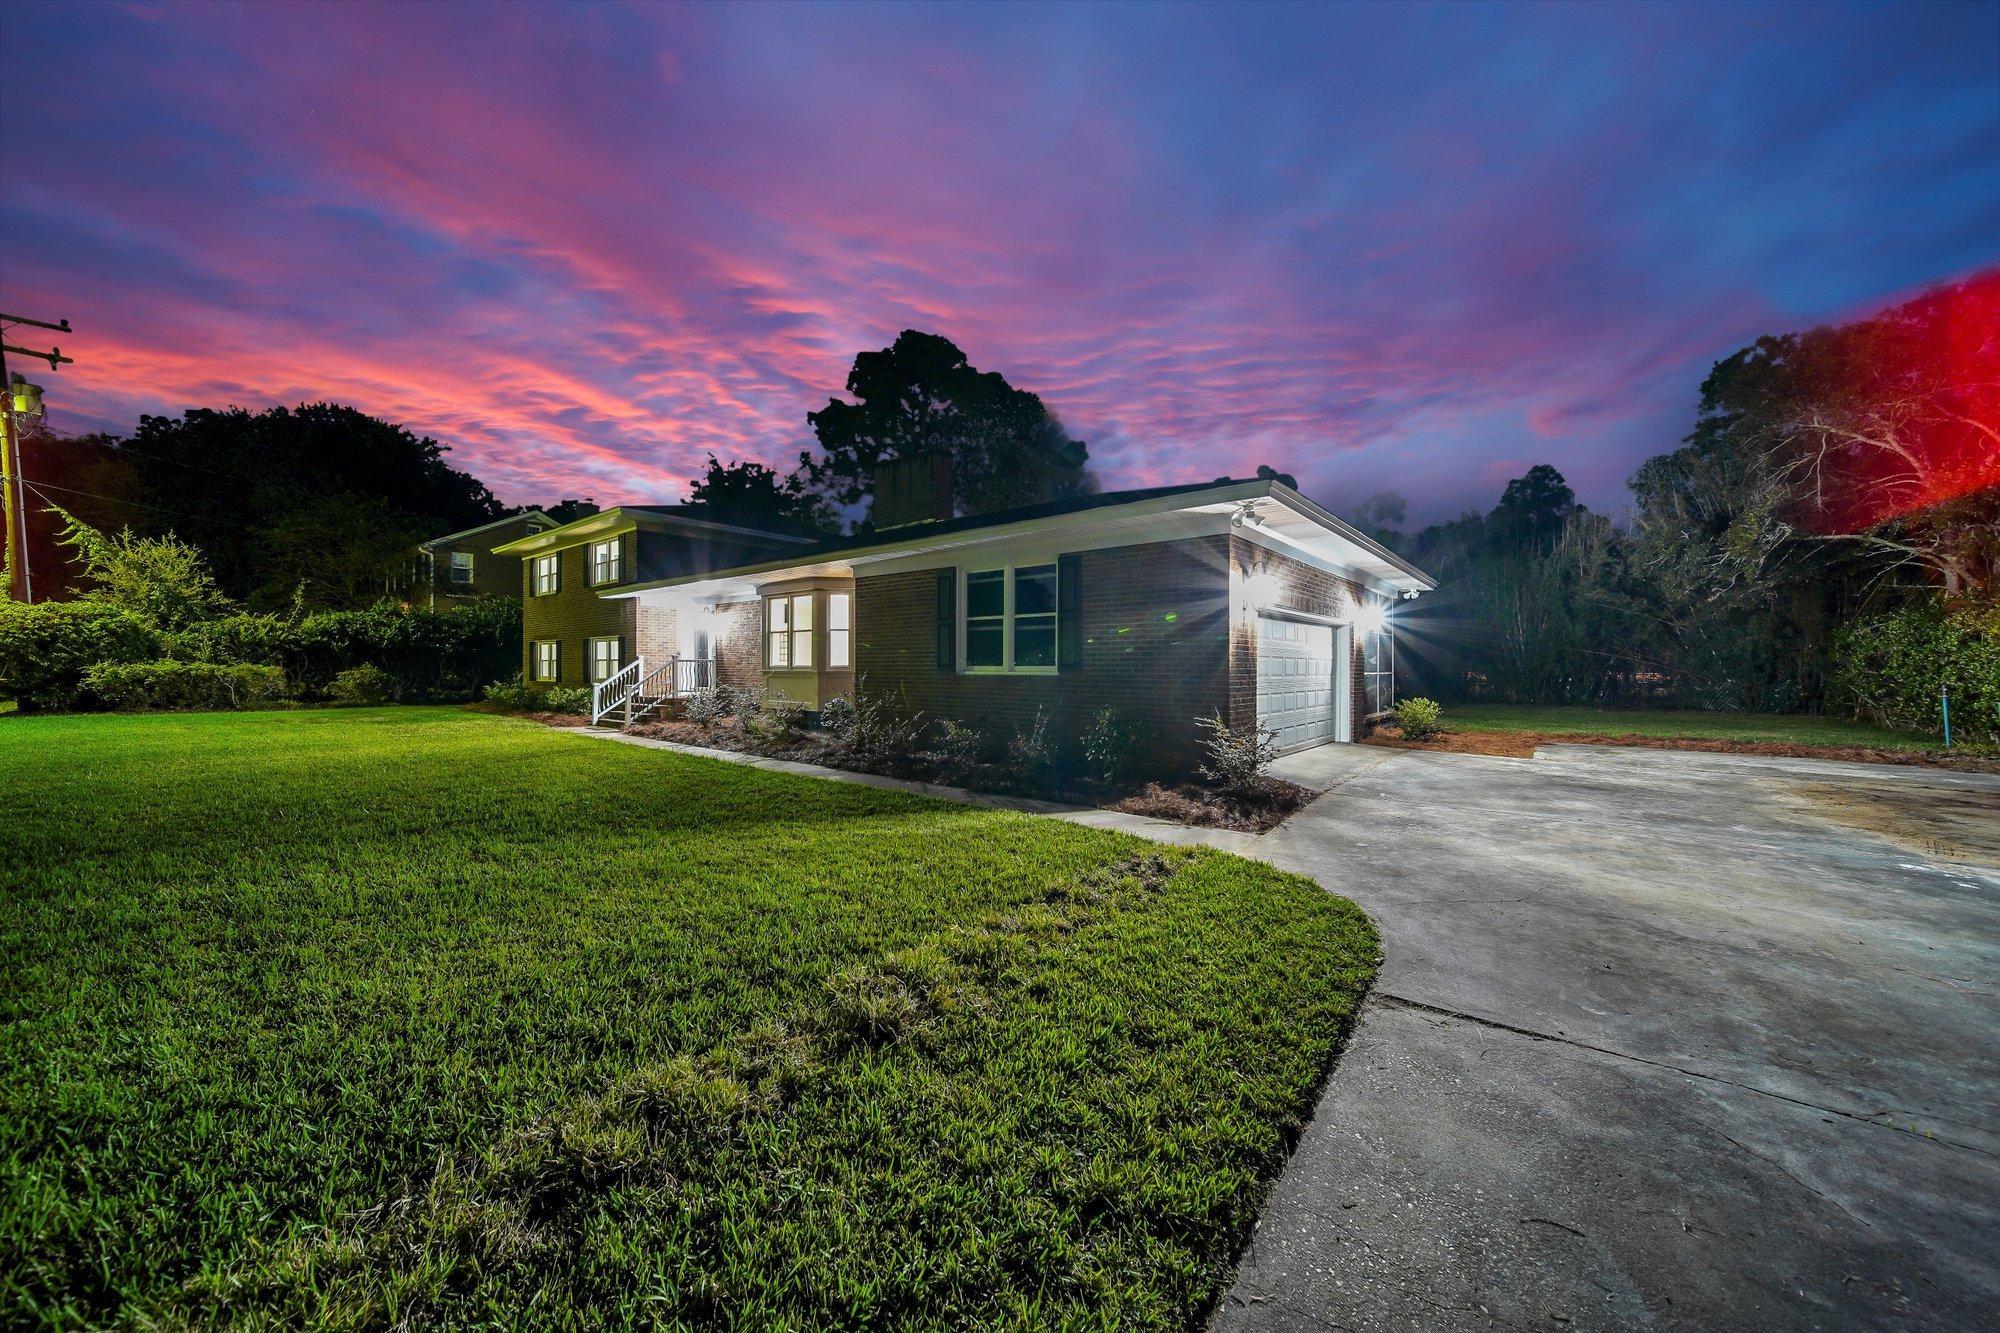 Country Club II Homes For Sale - 1477 Burningtree, Charleston, SC - 17